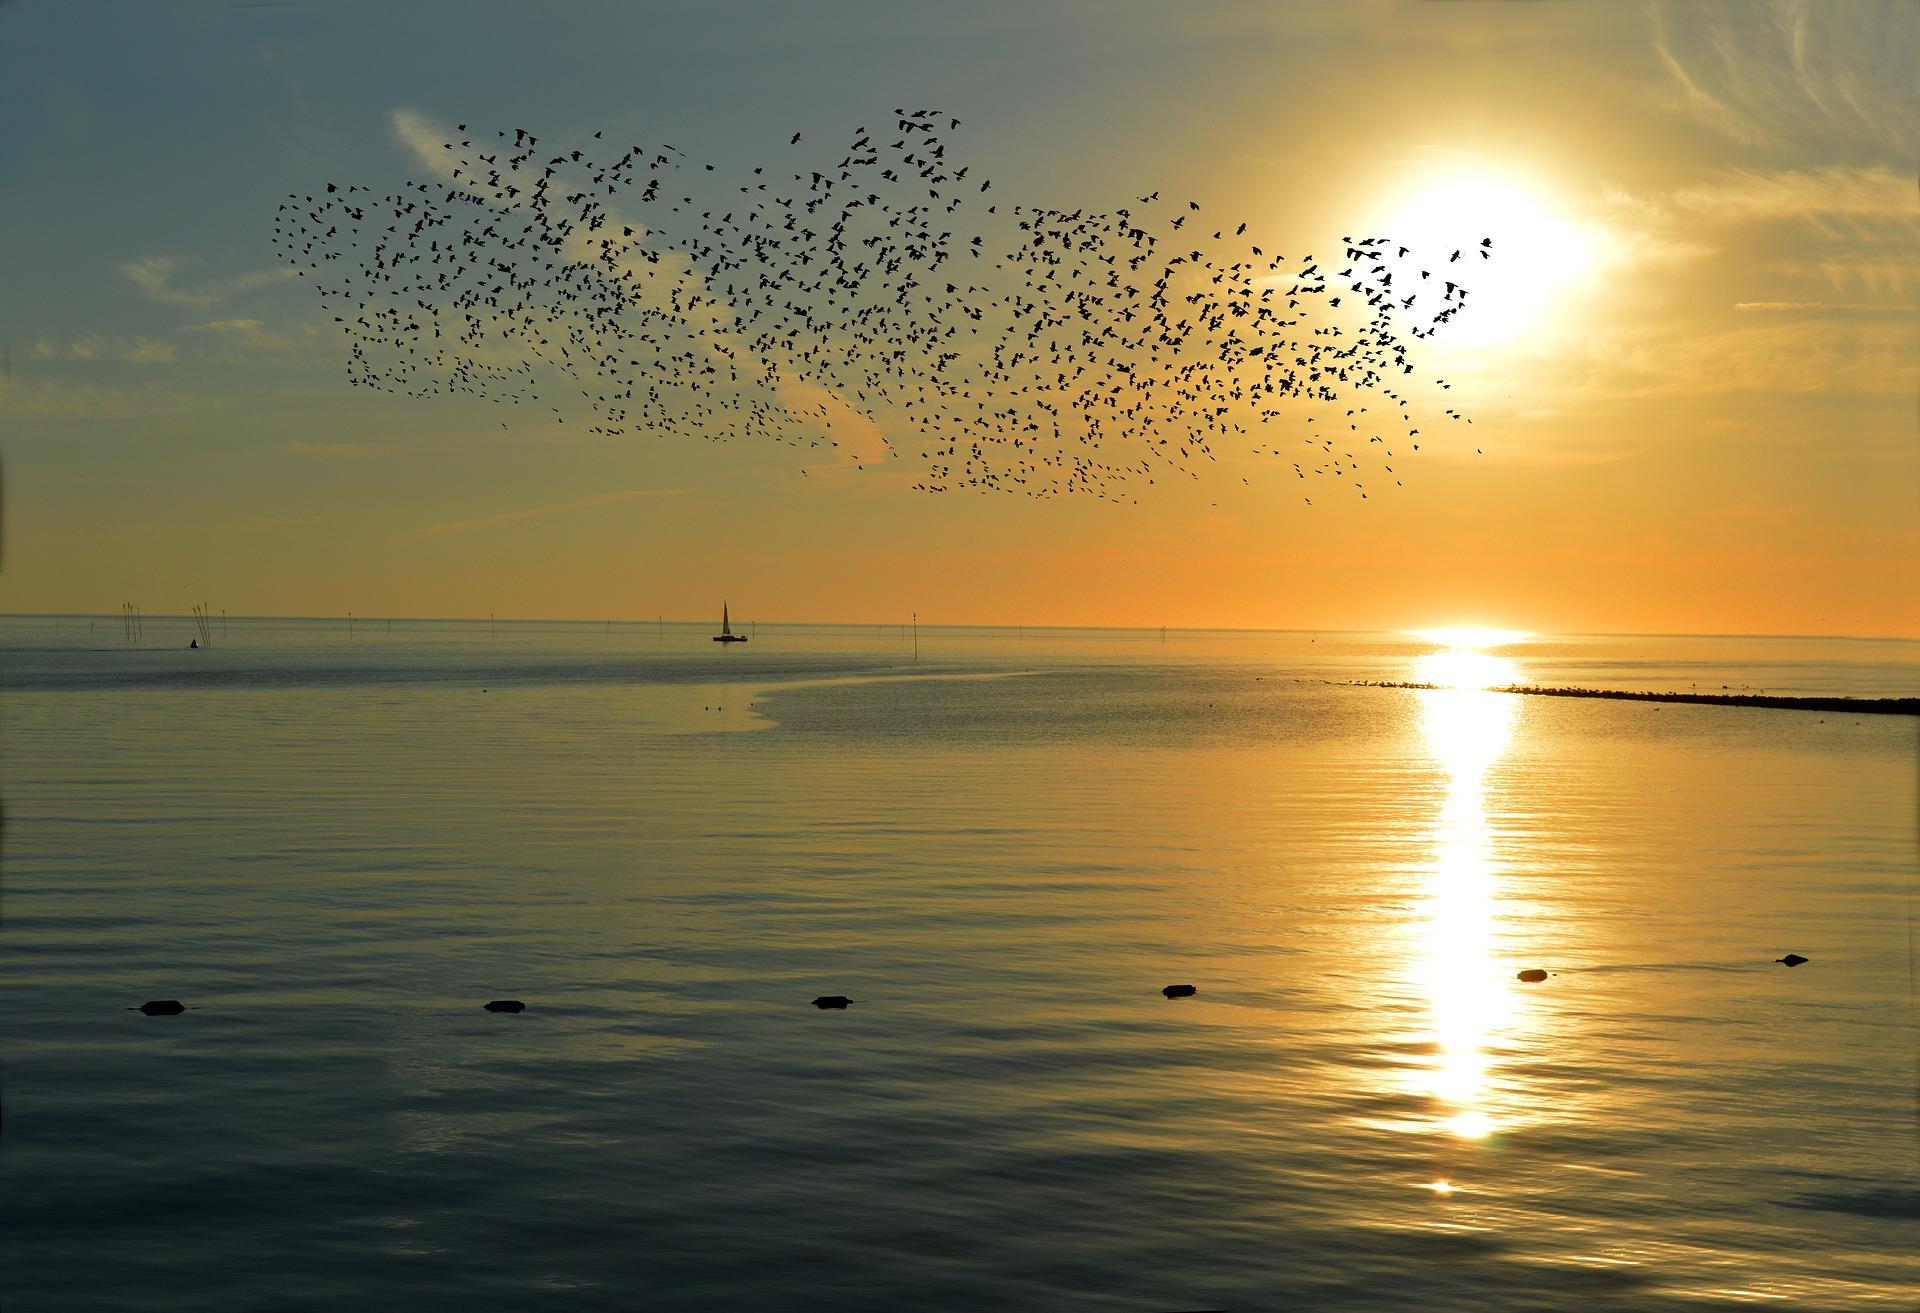 sunset-4649780_1920